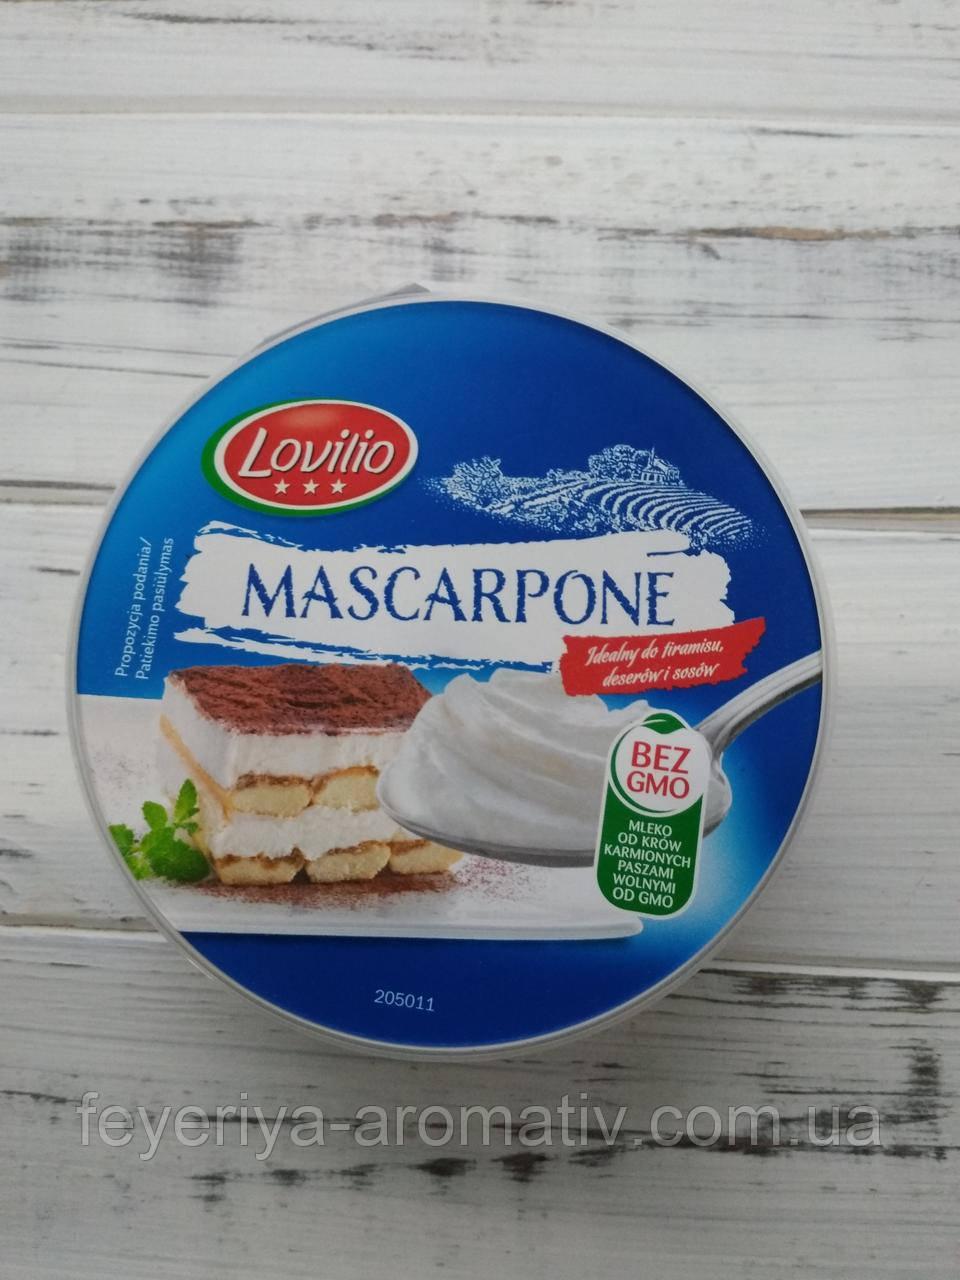 Сыр маскарпоне Lovilio Mascarpone, 250гр (Польша)